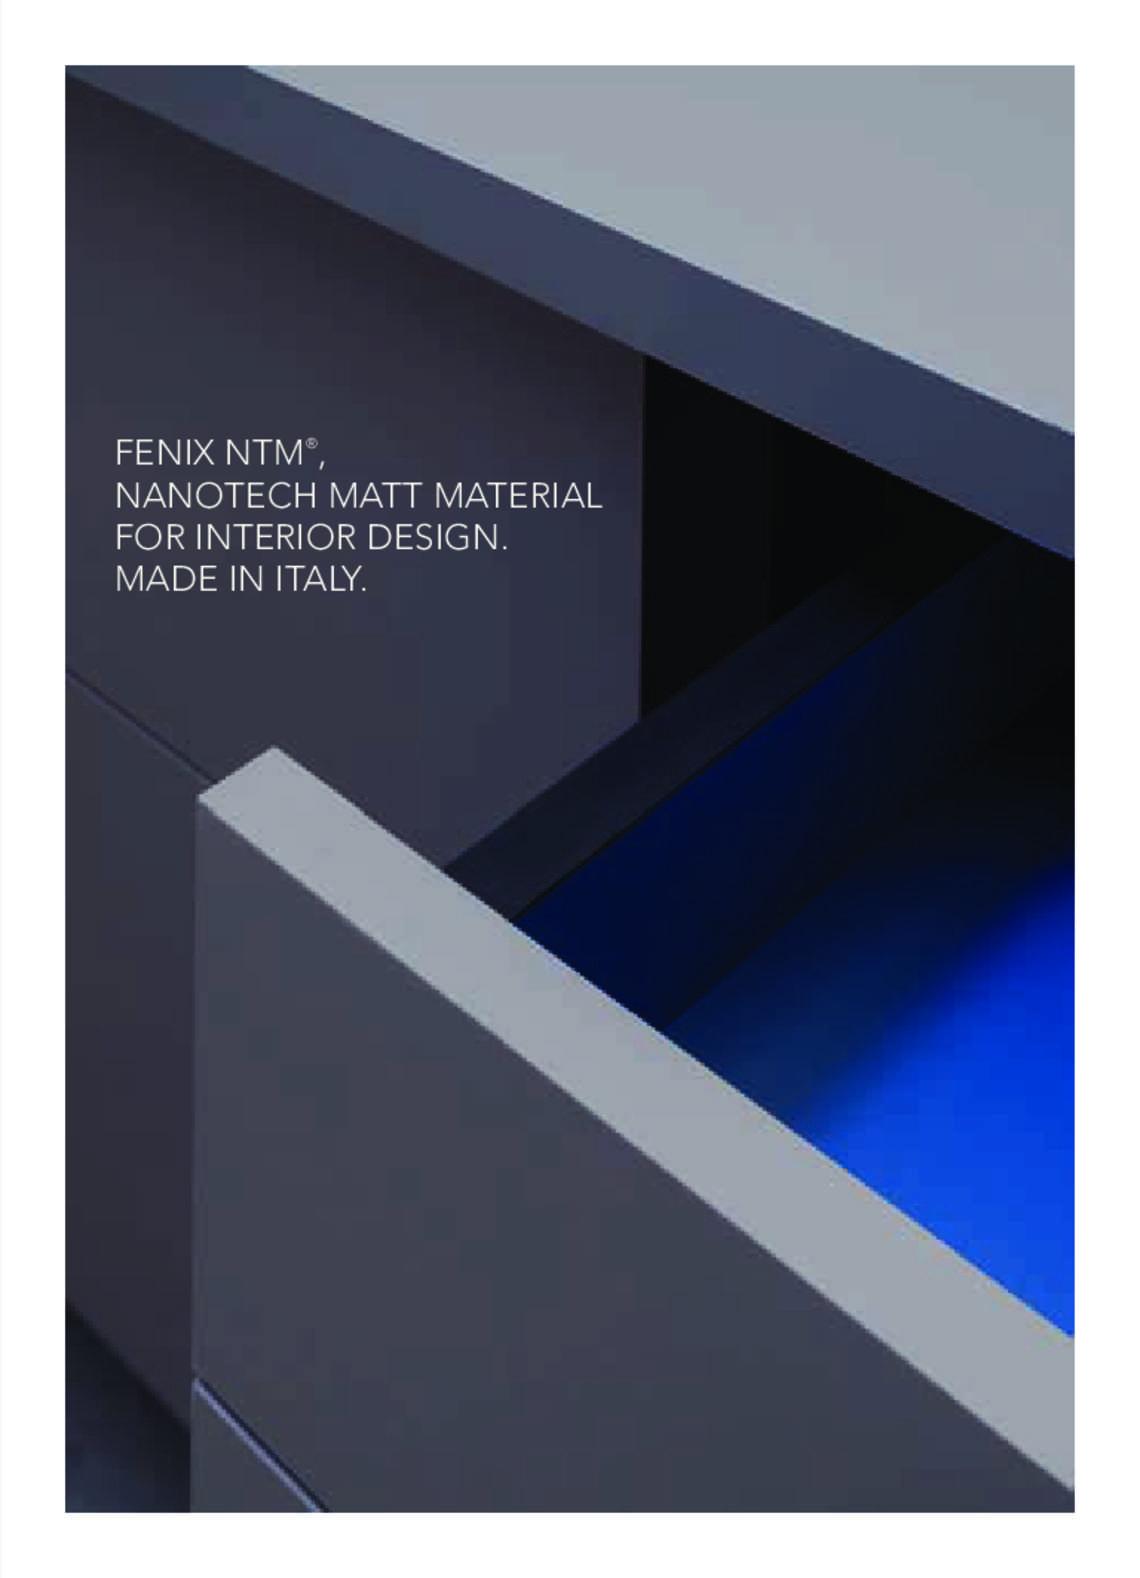 Catalogo fenix ntm di arpa industriale s p a pannelli for Fenix materiale